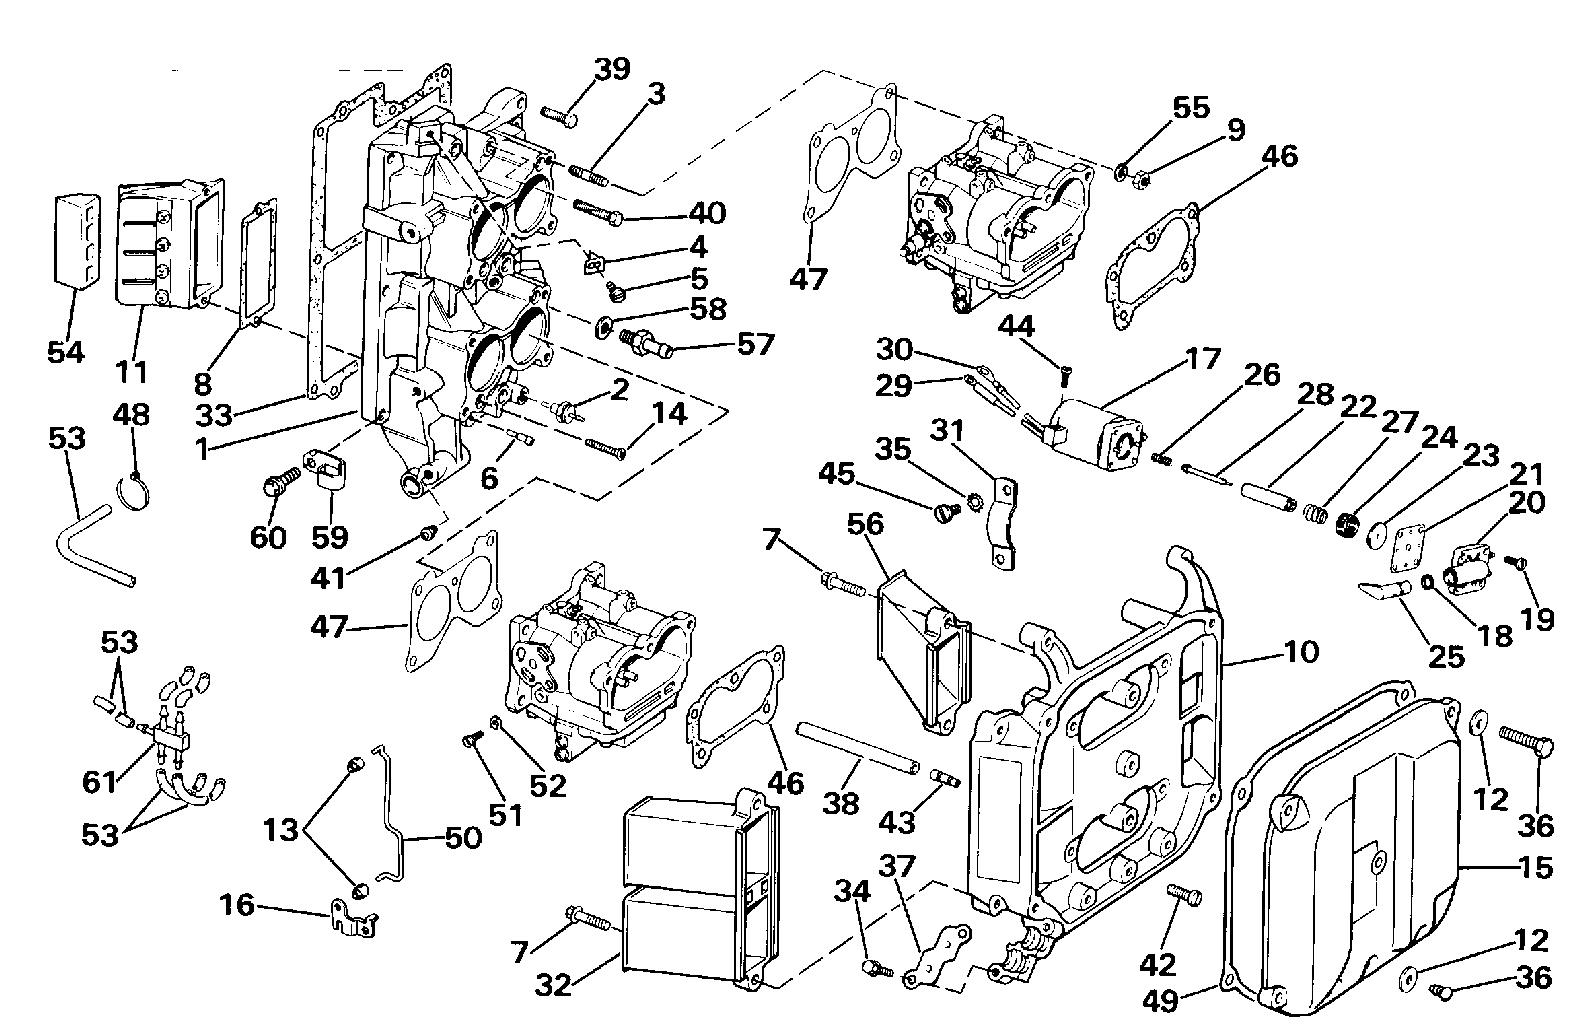 Johnson Outboard Motor Parts Diagram